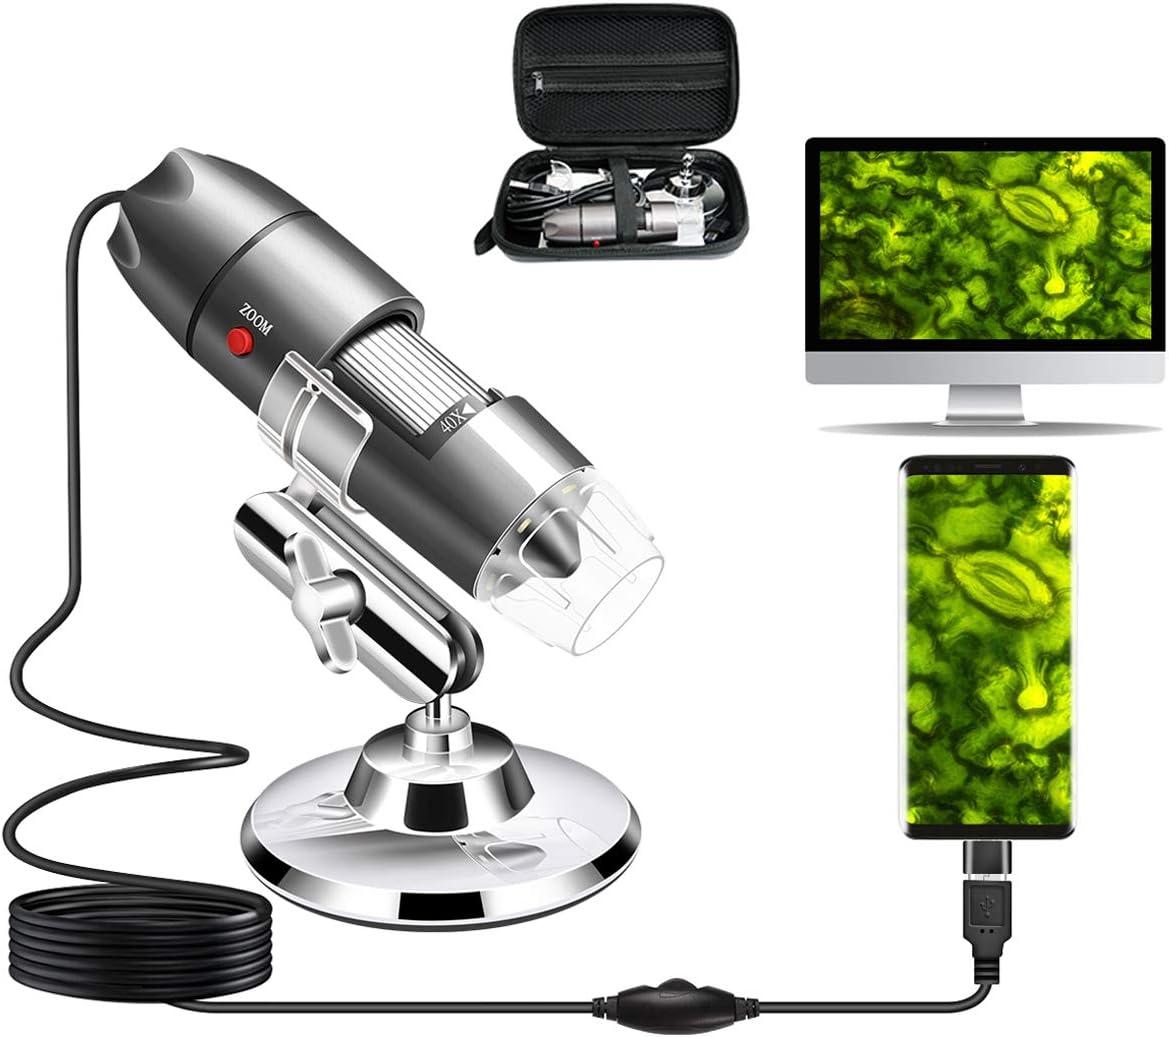 Cainda Usb Mikroskop Kamera 40 X Bis 1000 X Digitales Kamera